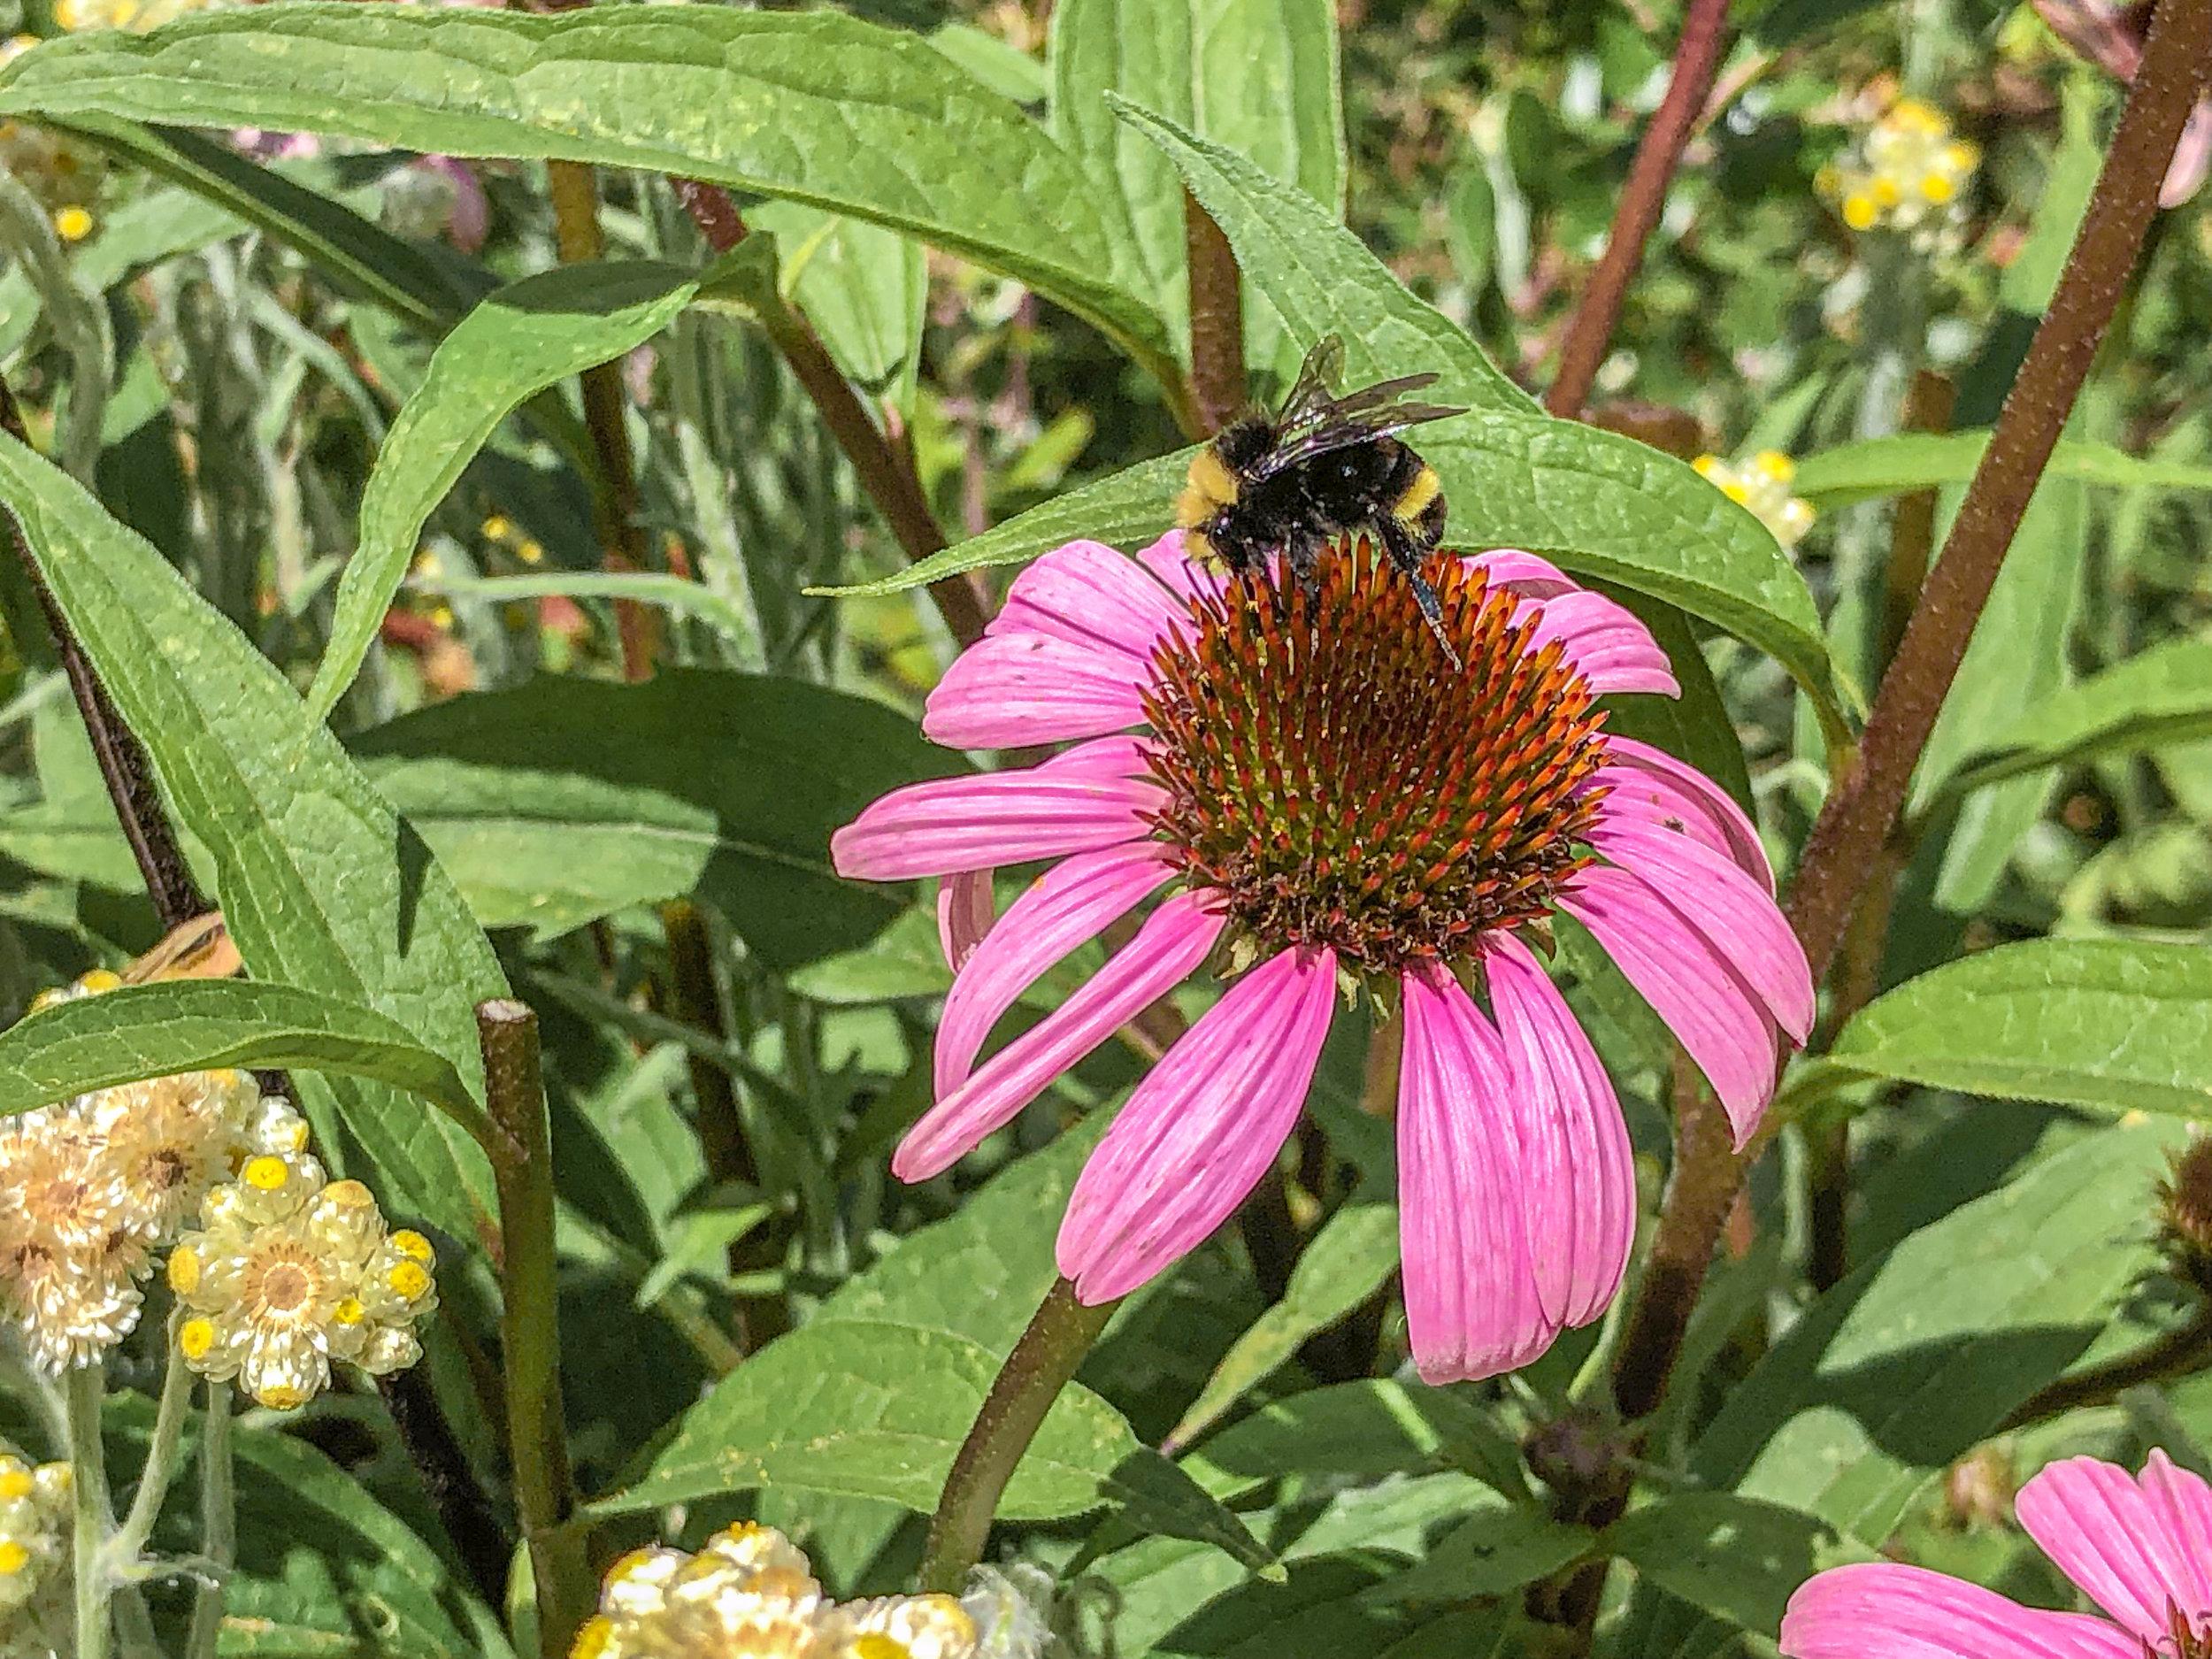 A Yellow Face Bumble Bee ( Bombus vosnesenskii)  collecting nectar.